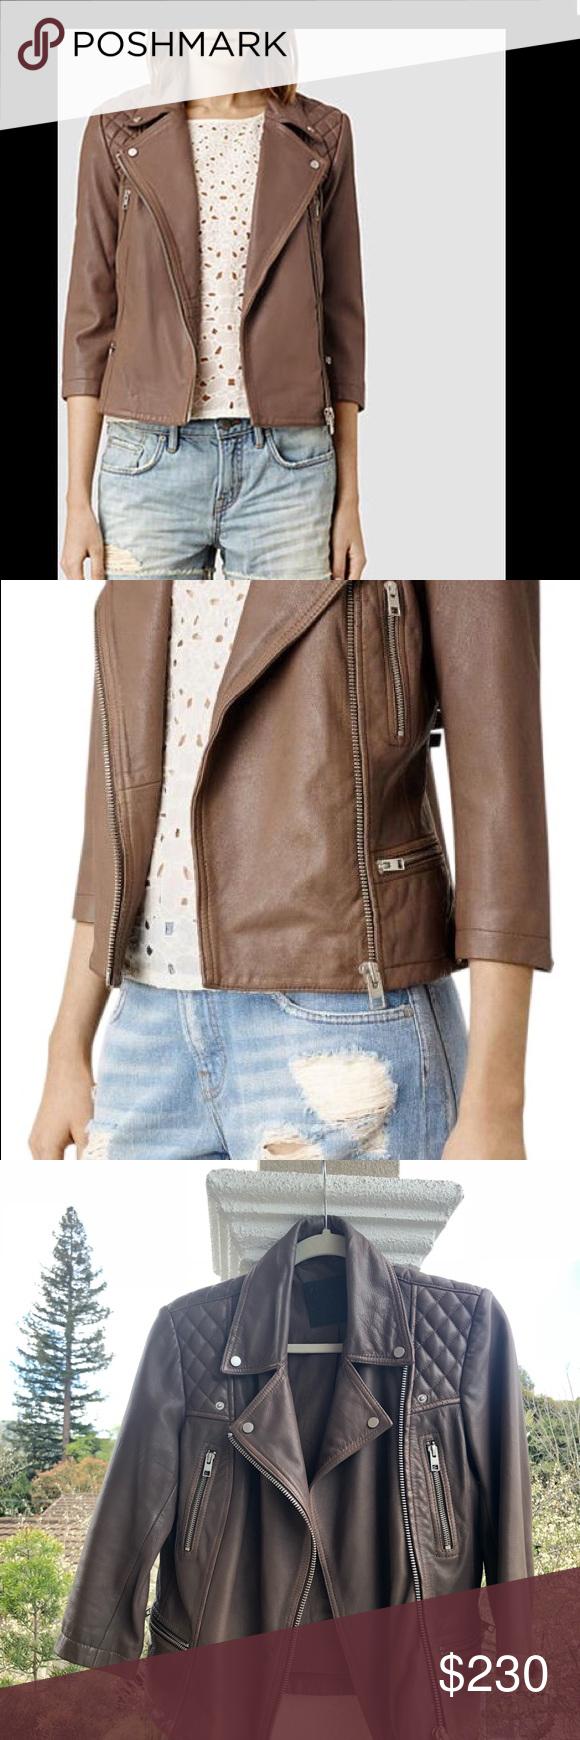 All Saints Leather Jacket. US size 6 All saints leather